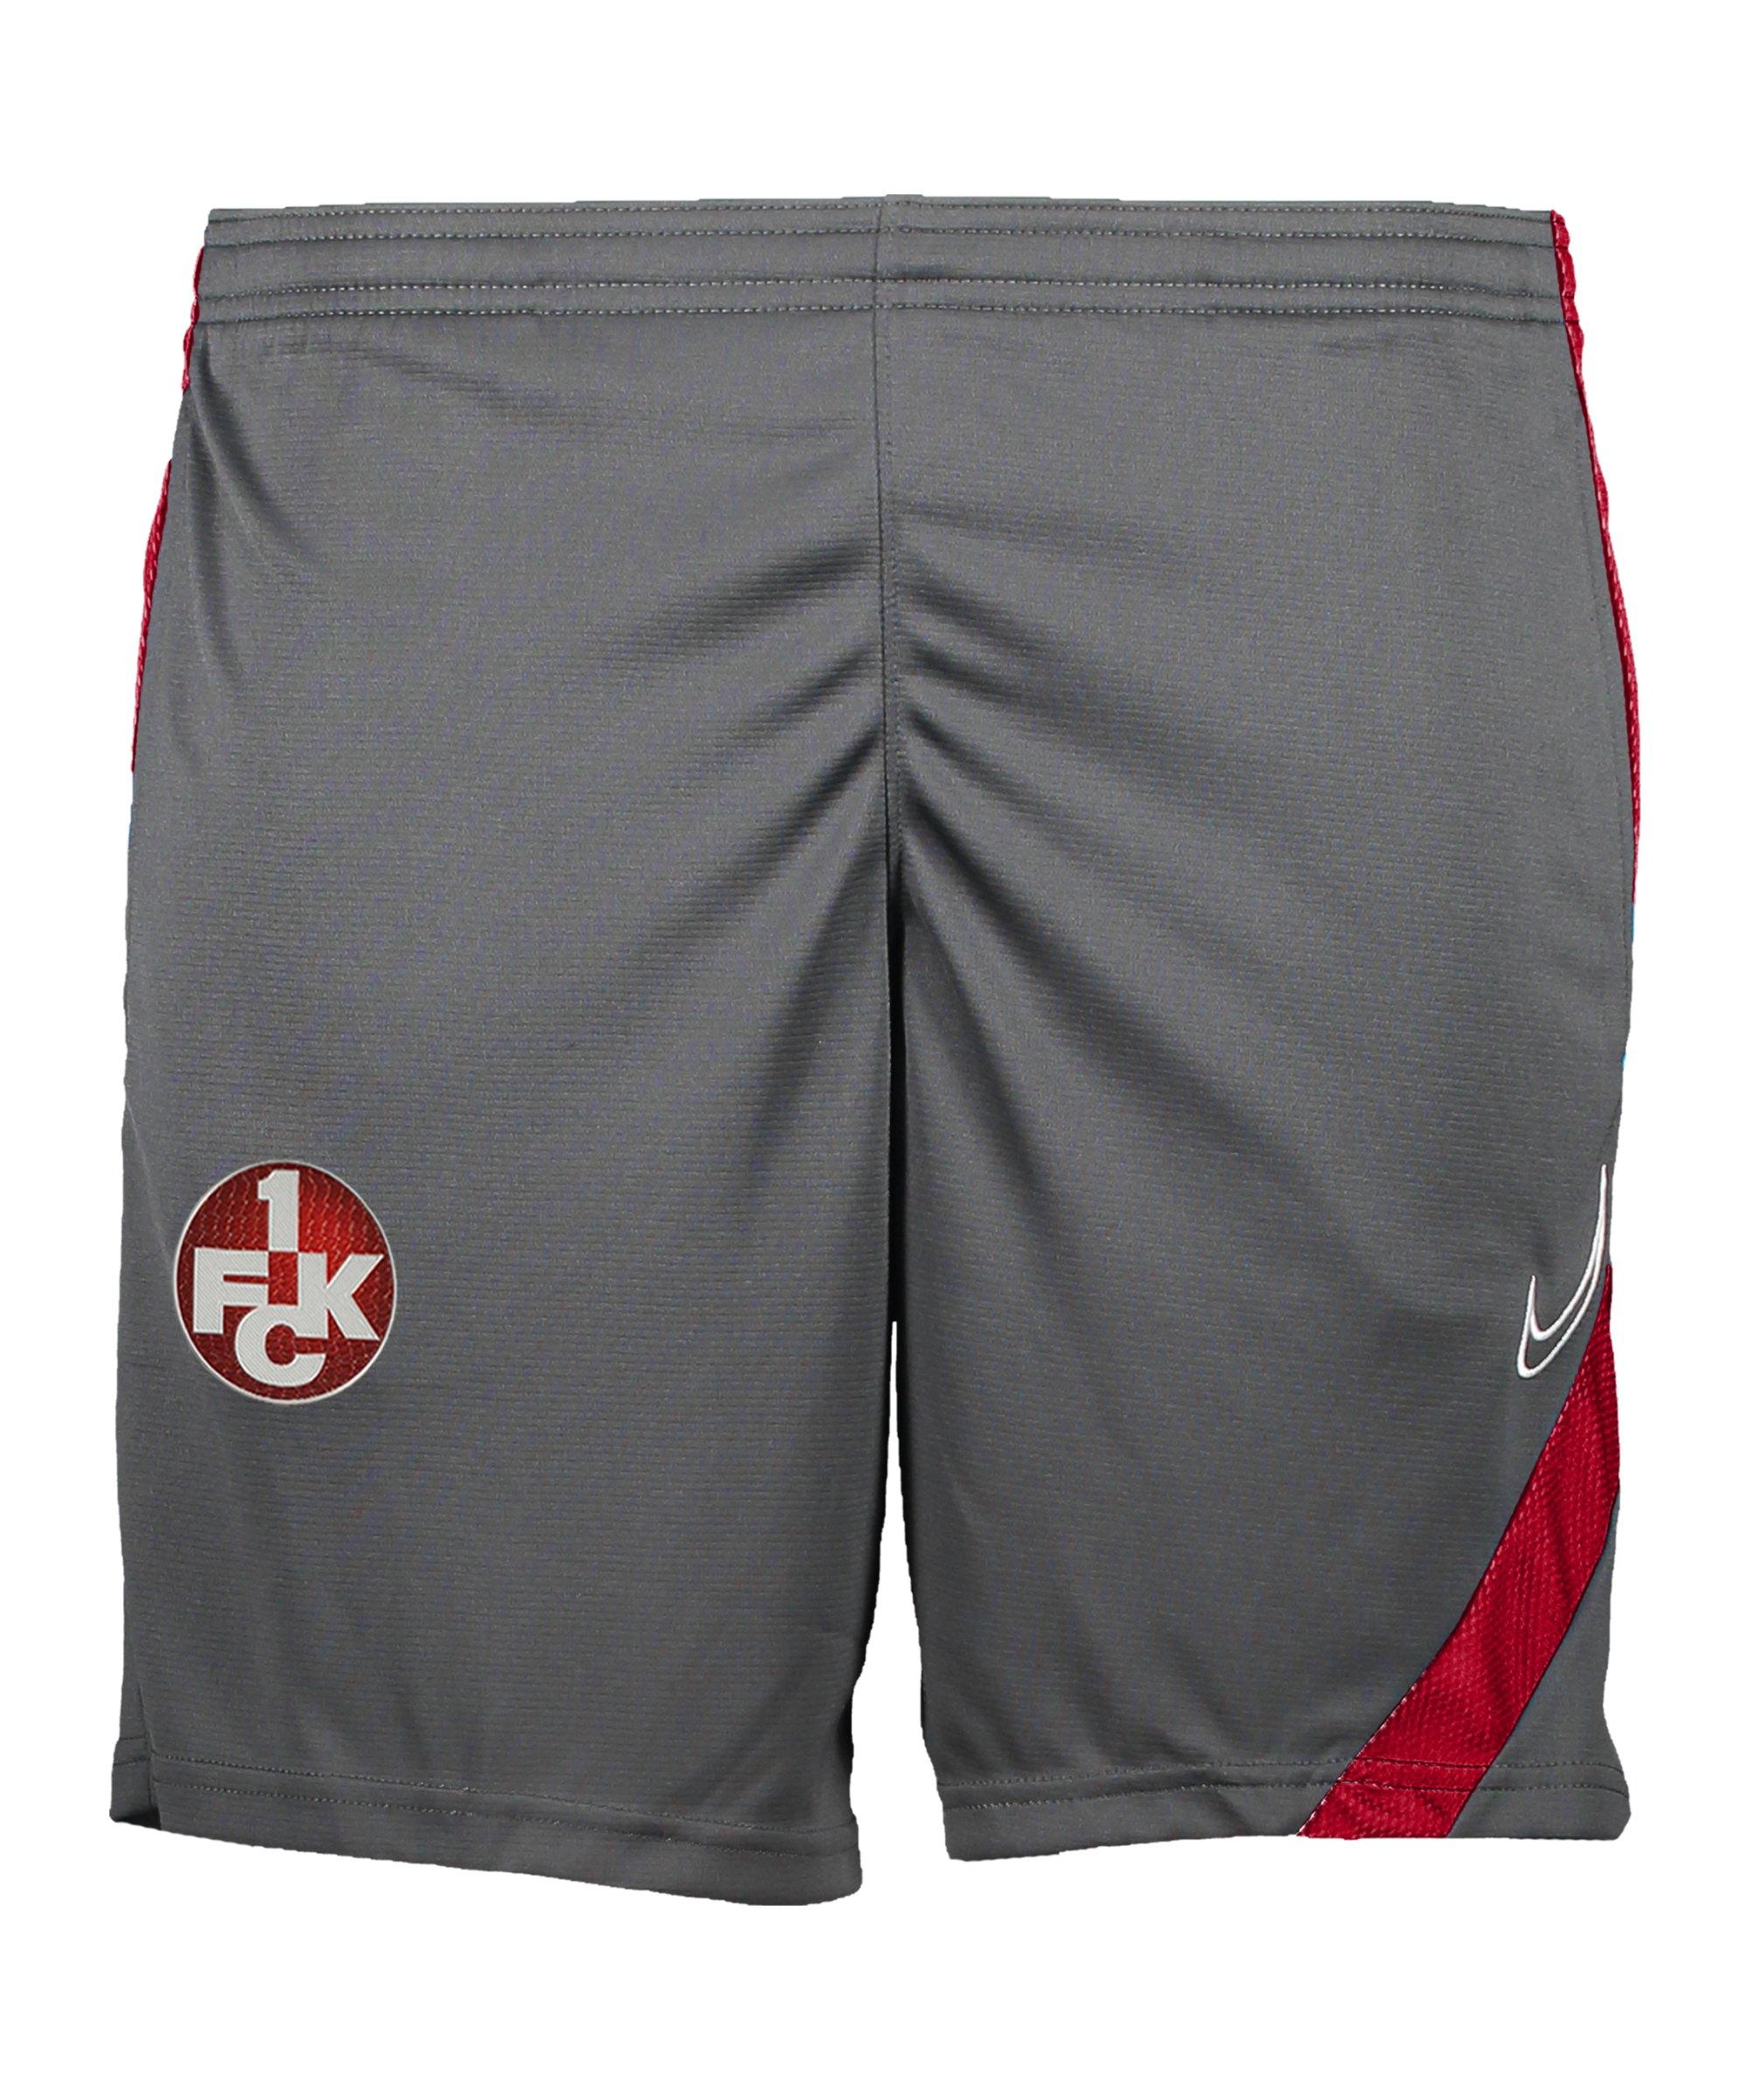 Nike 1. FC Kaiserslautern Short F062 - grau